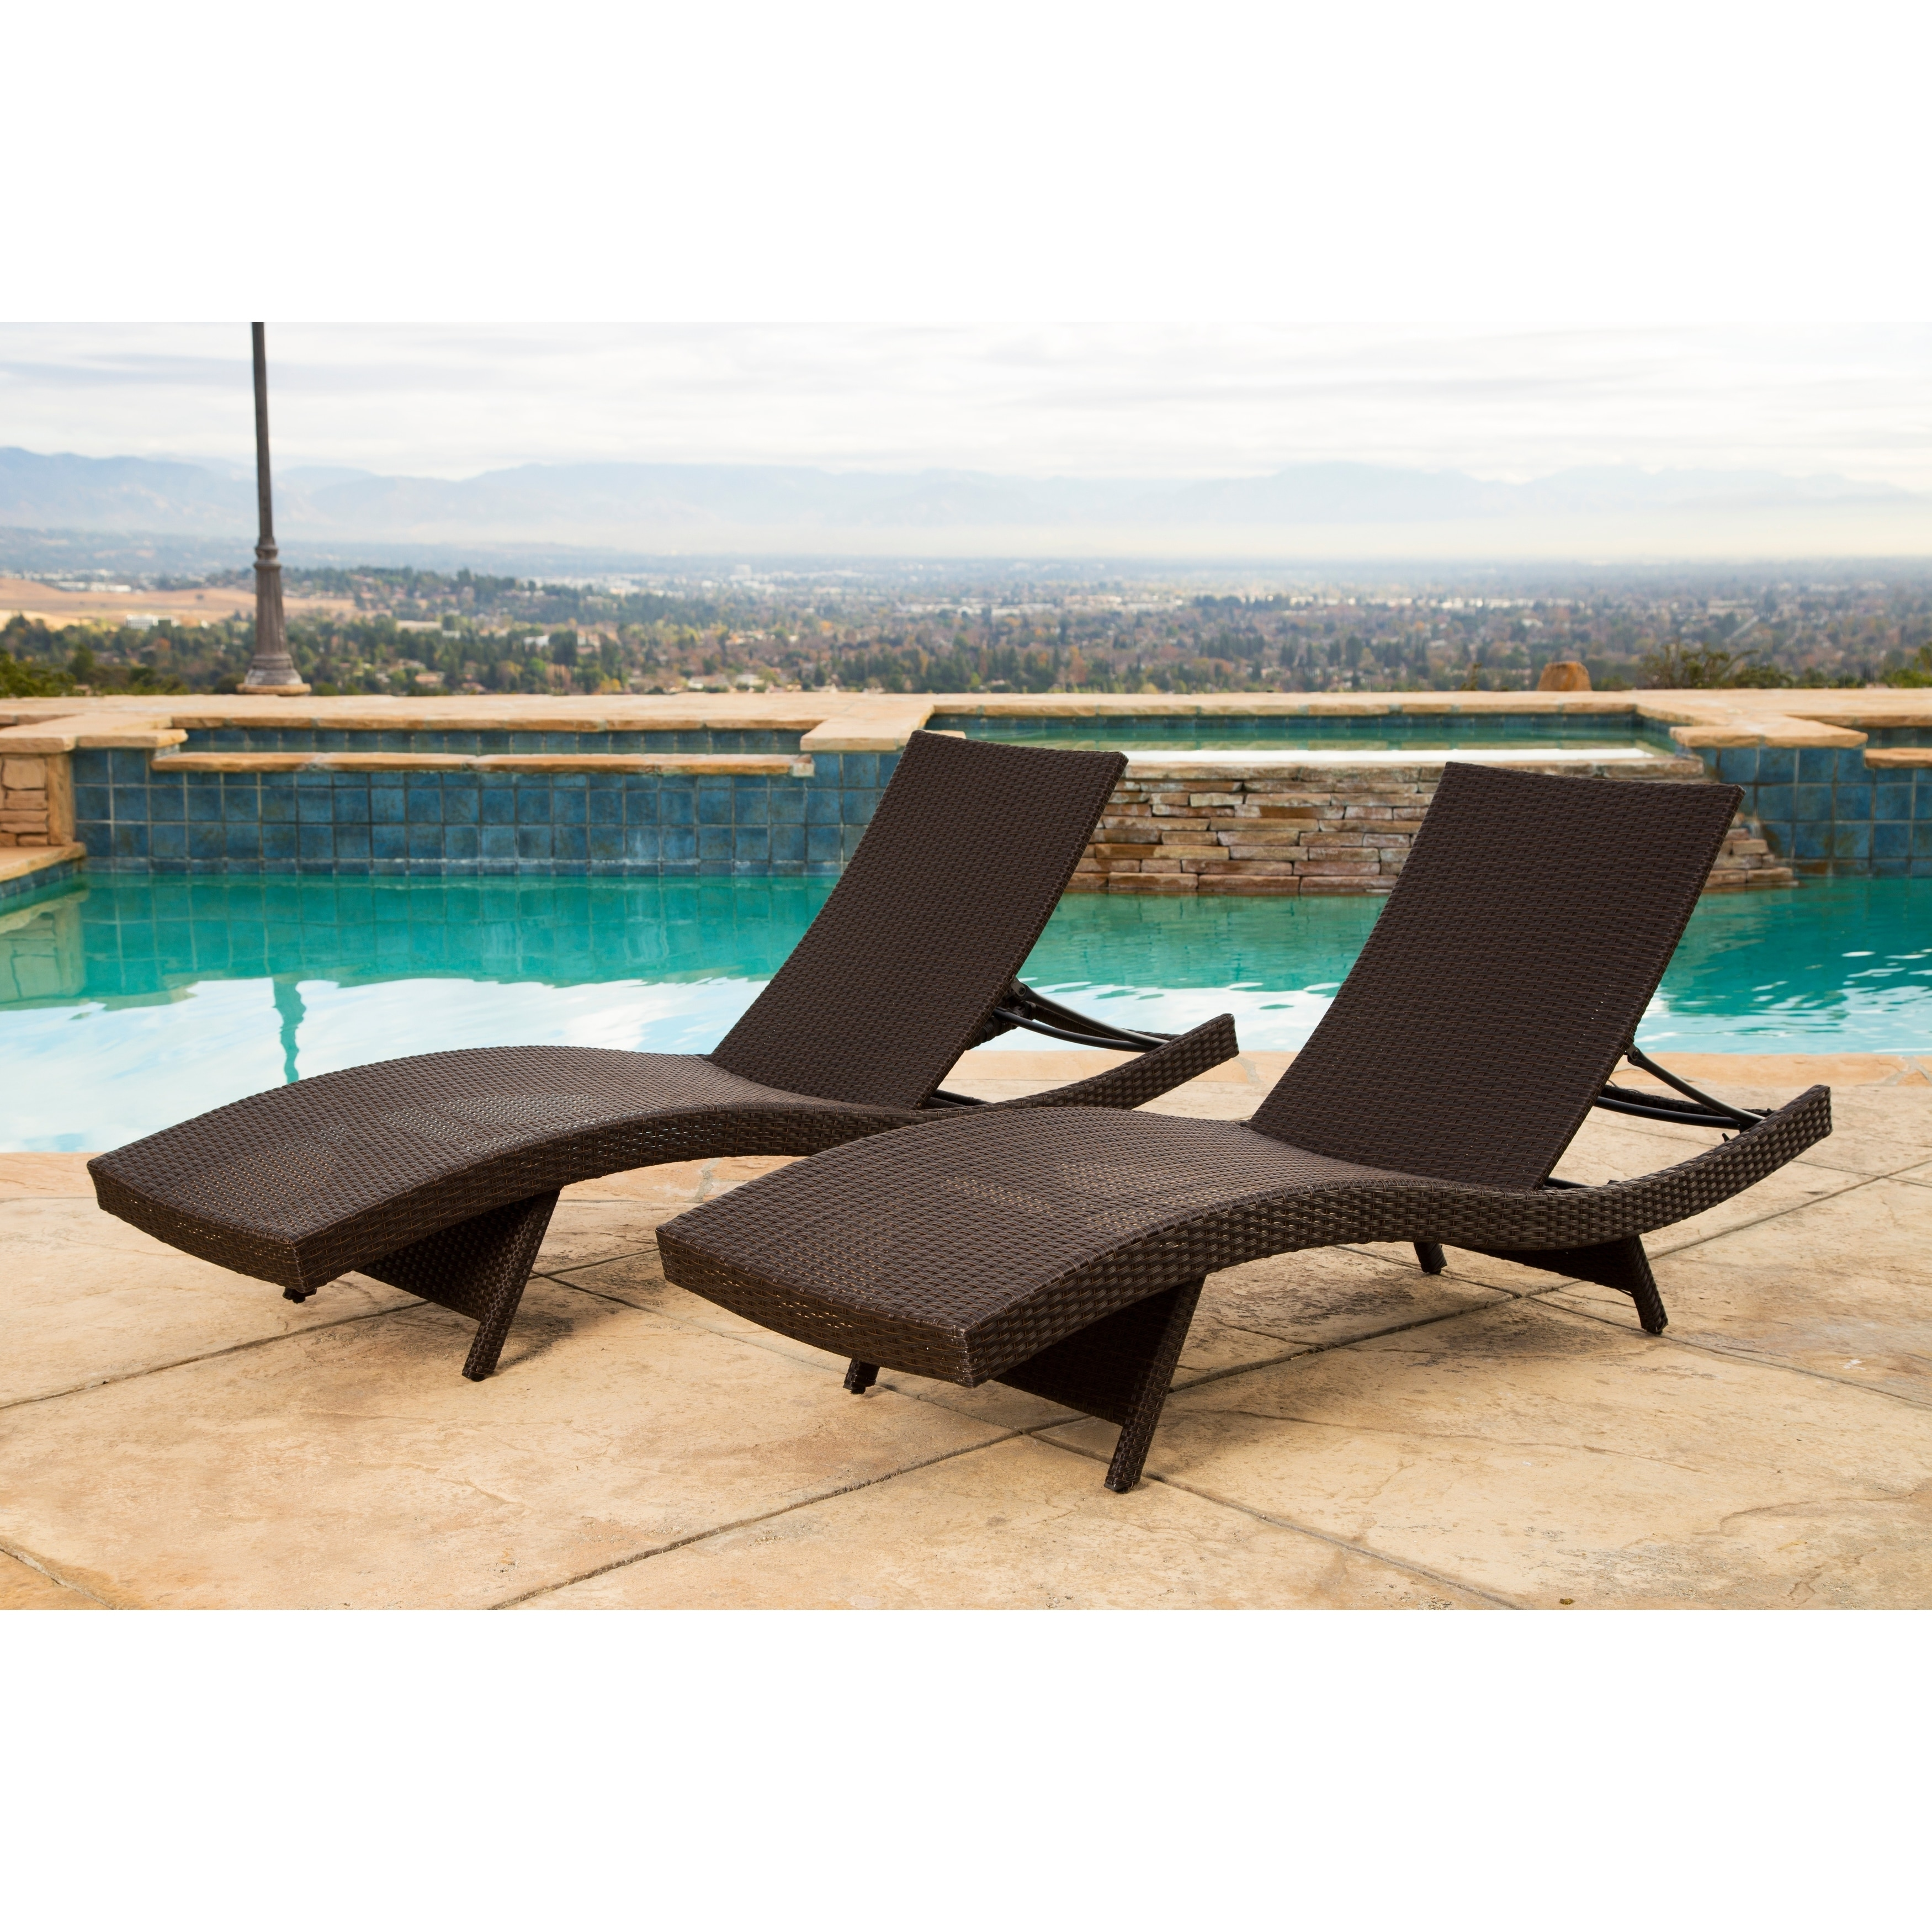 Shop Abbyson Palermo Outdoor Dark Brown Wicker Chaise Lounge Set Of